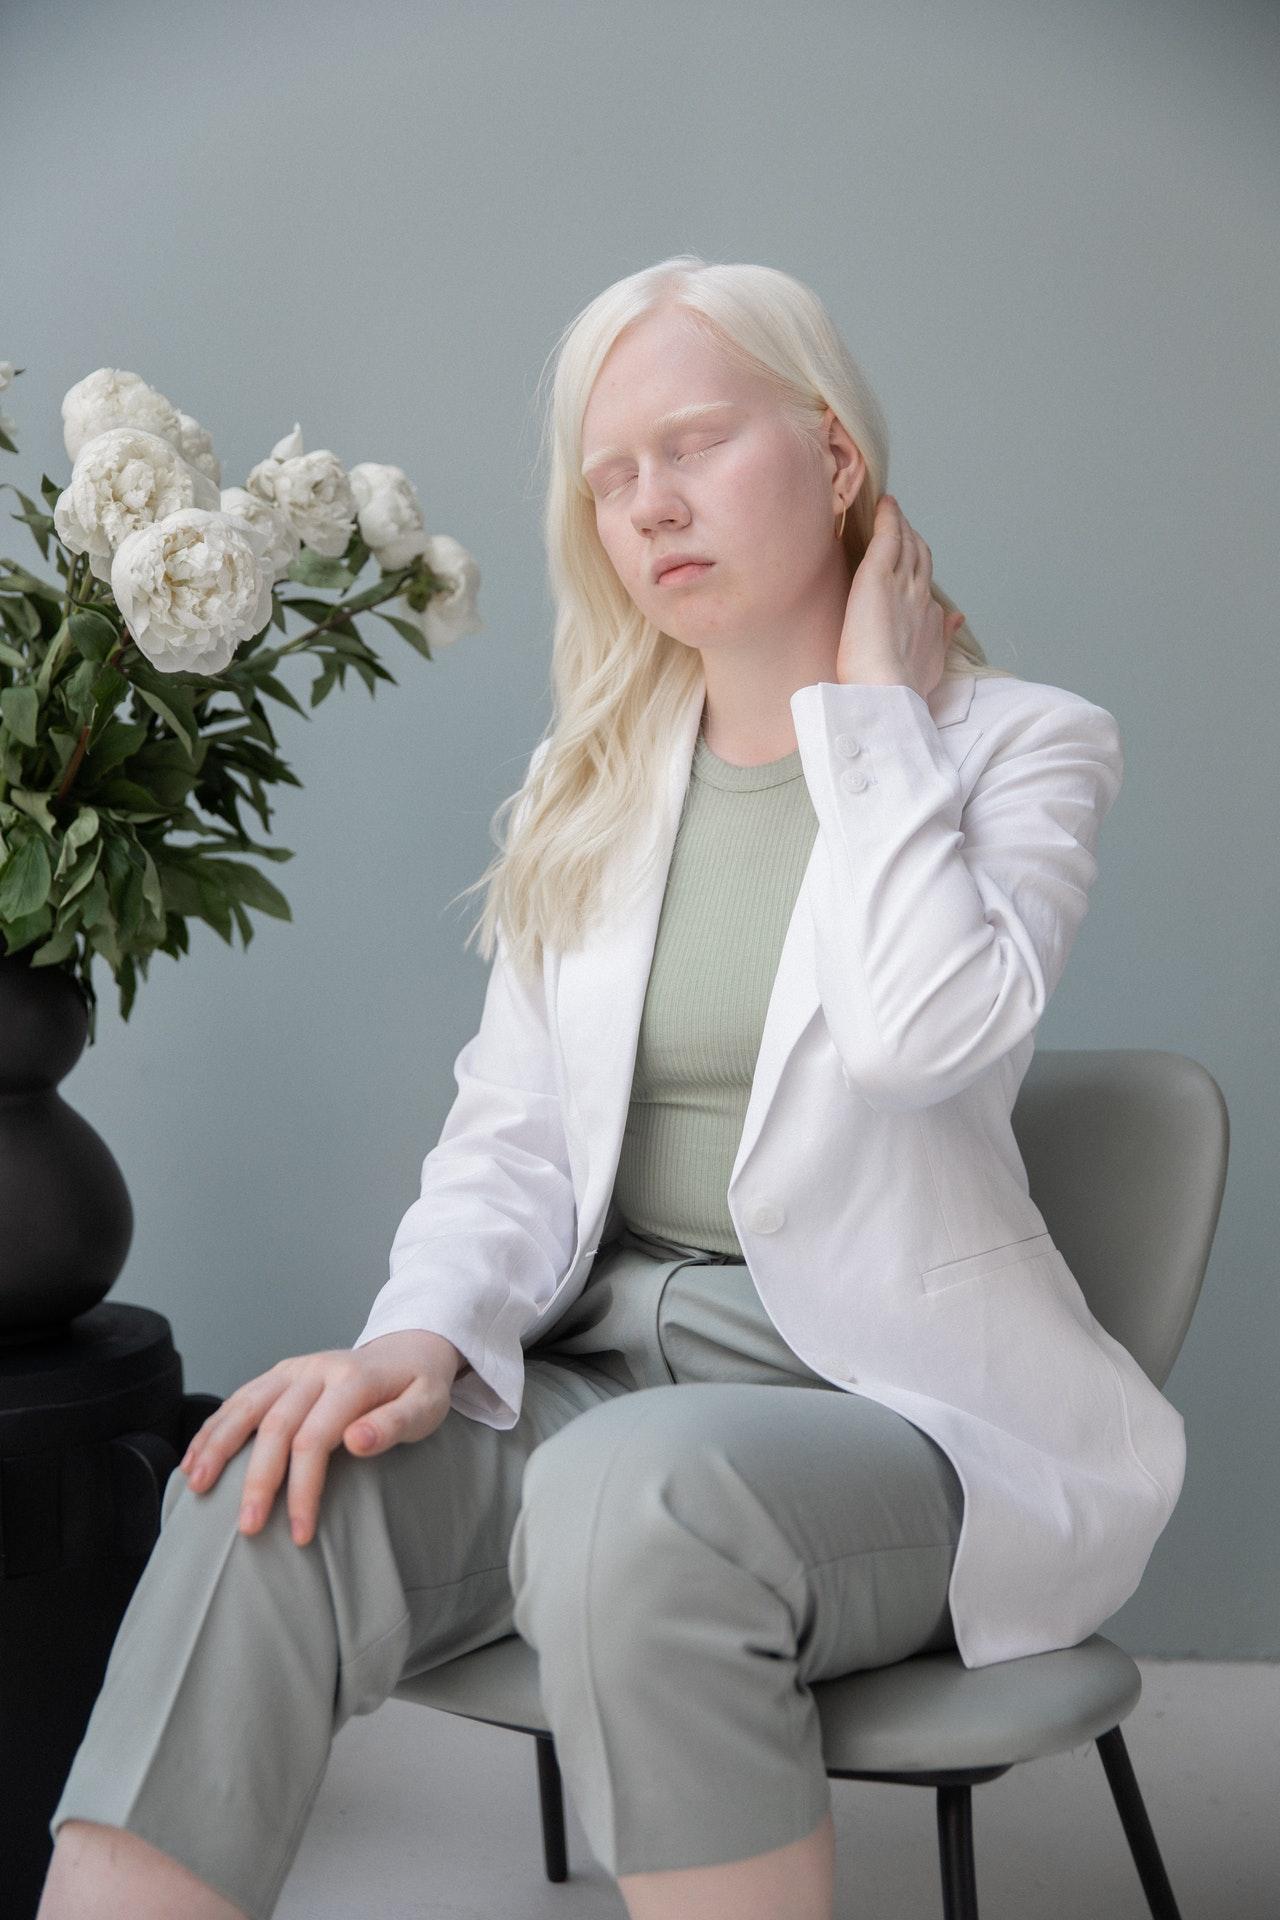 Neck Pain Treatment in Henderson, NV & Las Vegas, NV